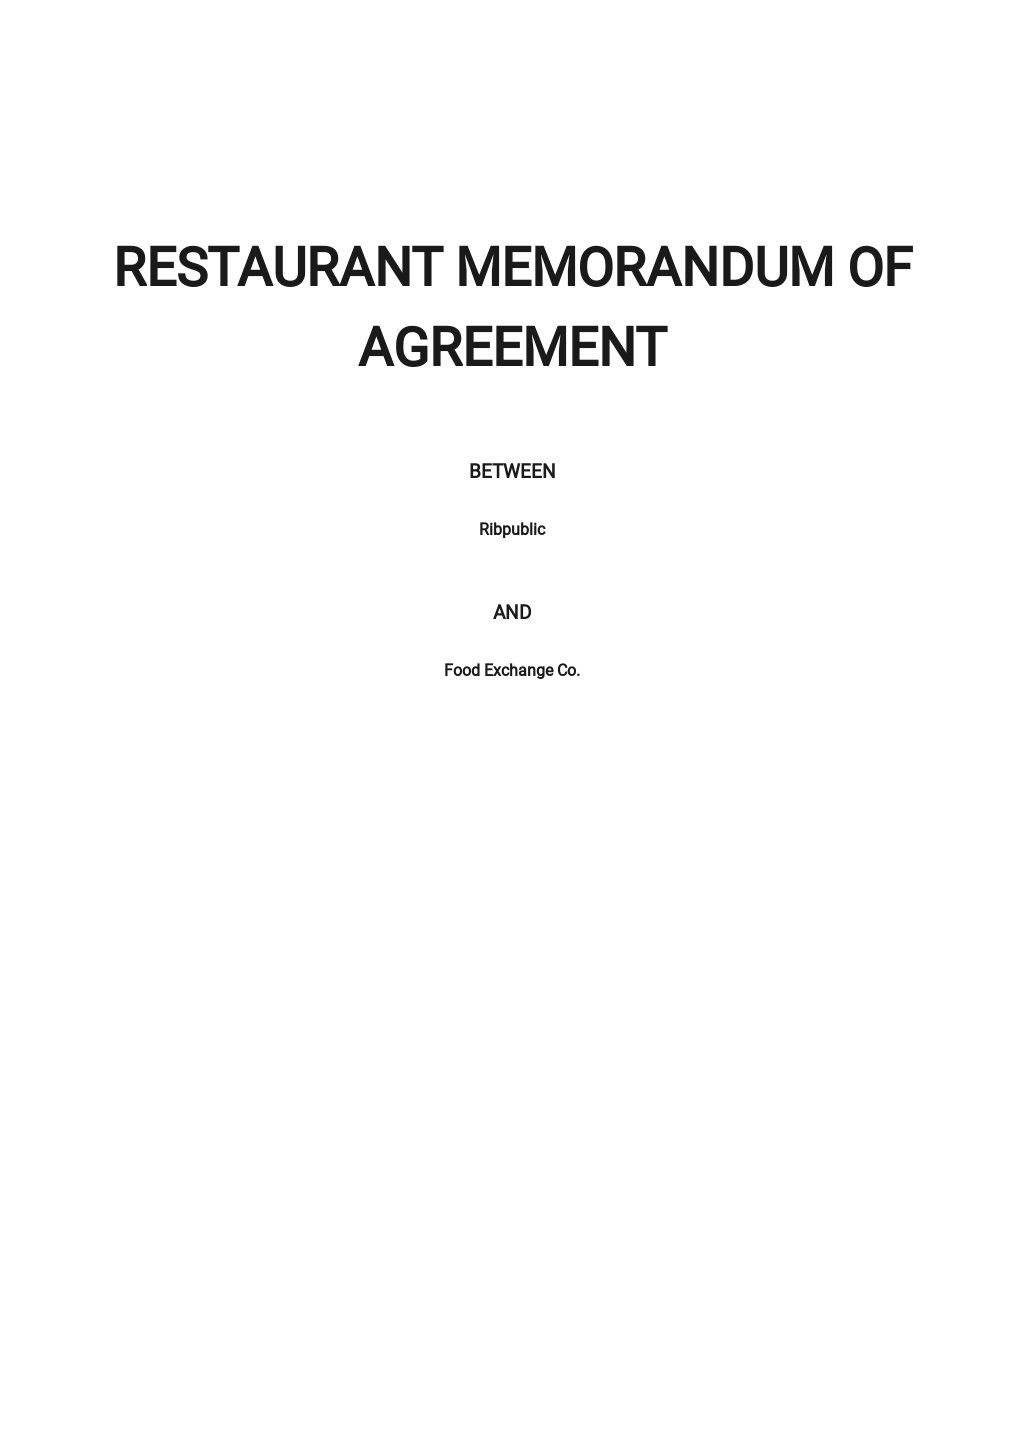 Restaurant Memorandum of Agreement Template.jpe